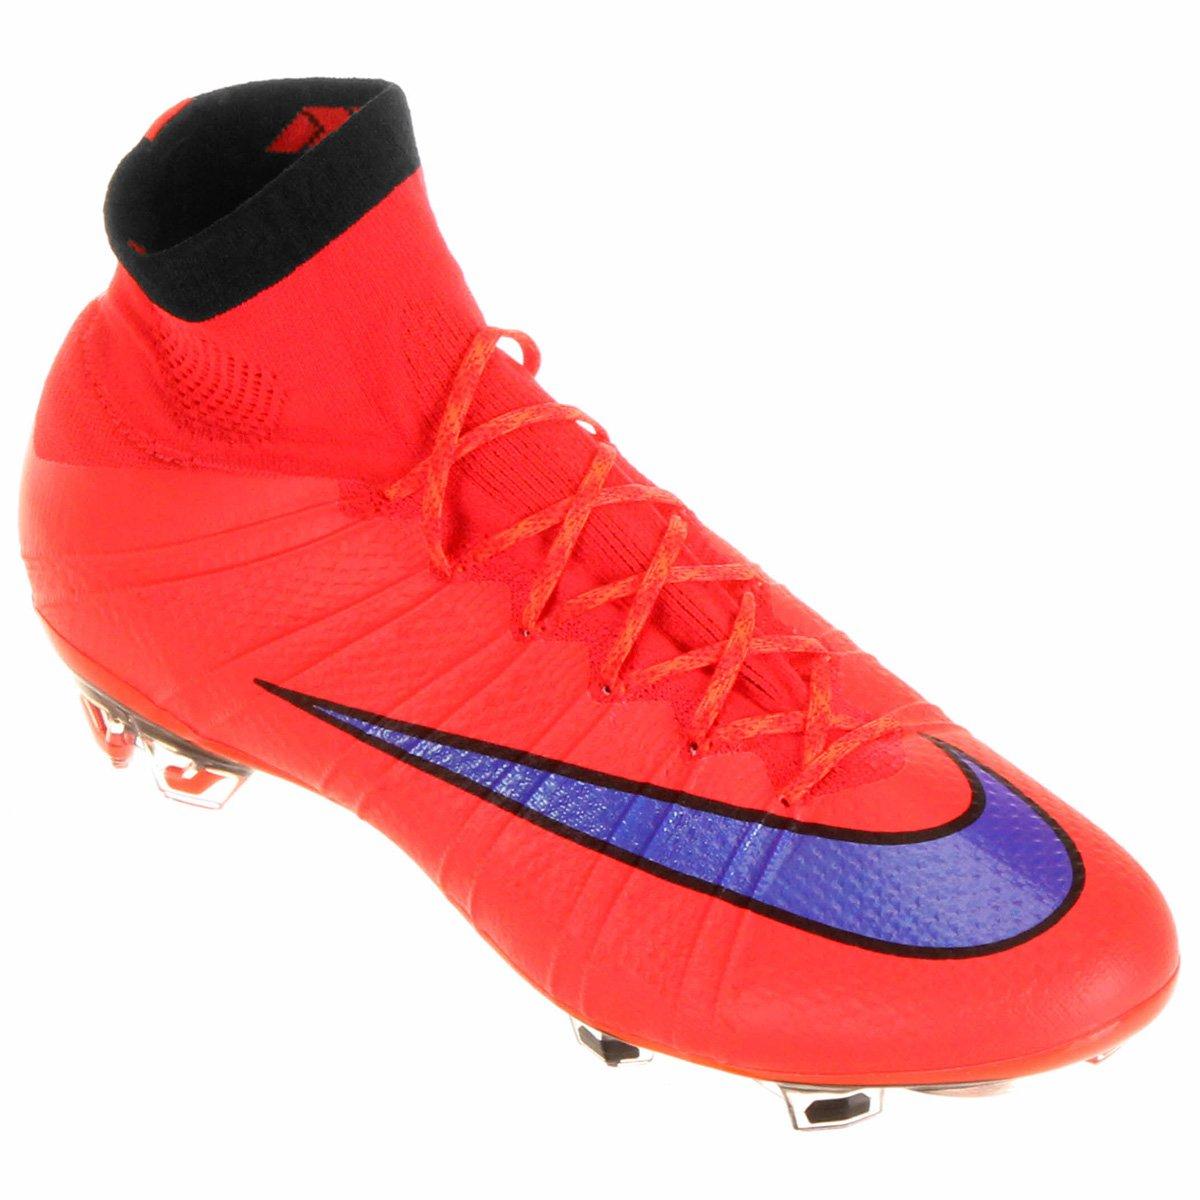 new style d30ee 7f1b7 Chuteira Nike Mercurial Superfly FG Campo - Compre Agora  Ne